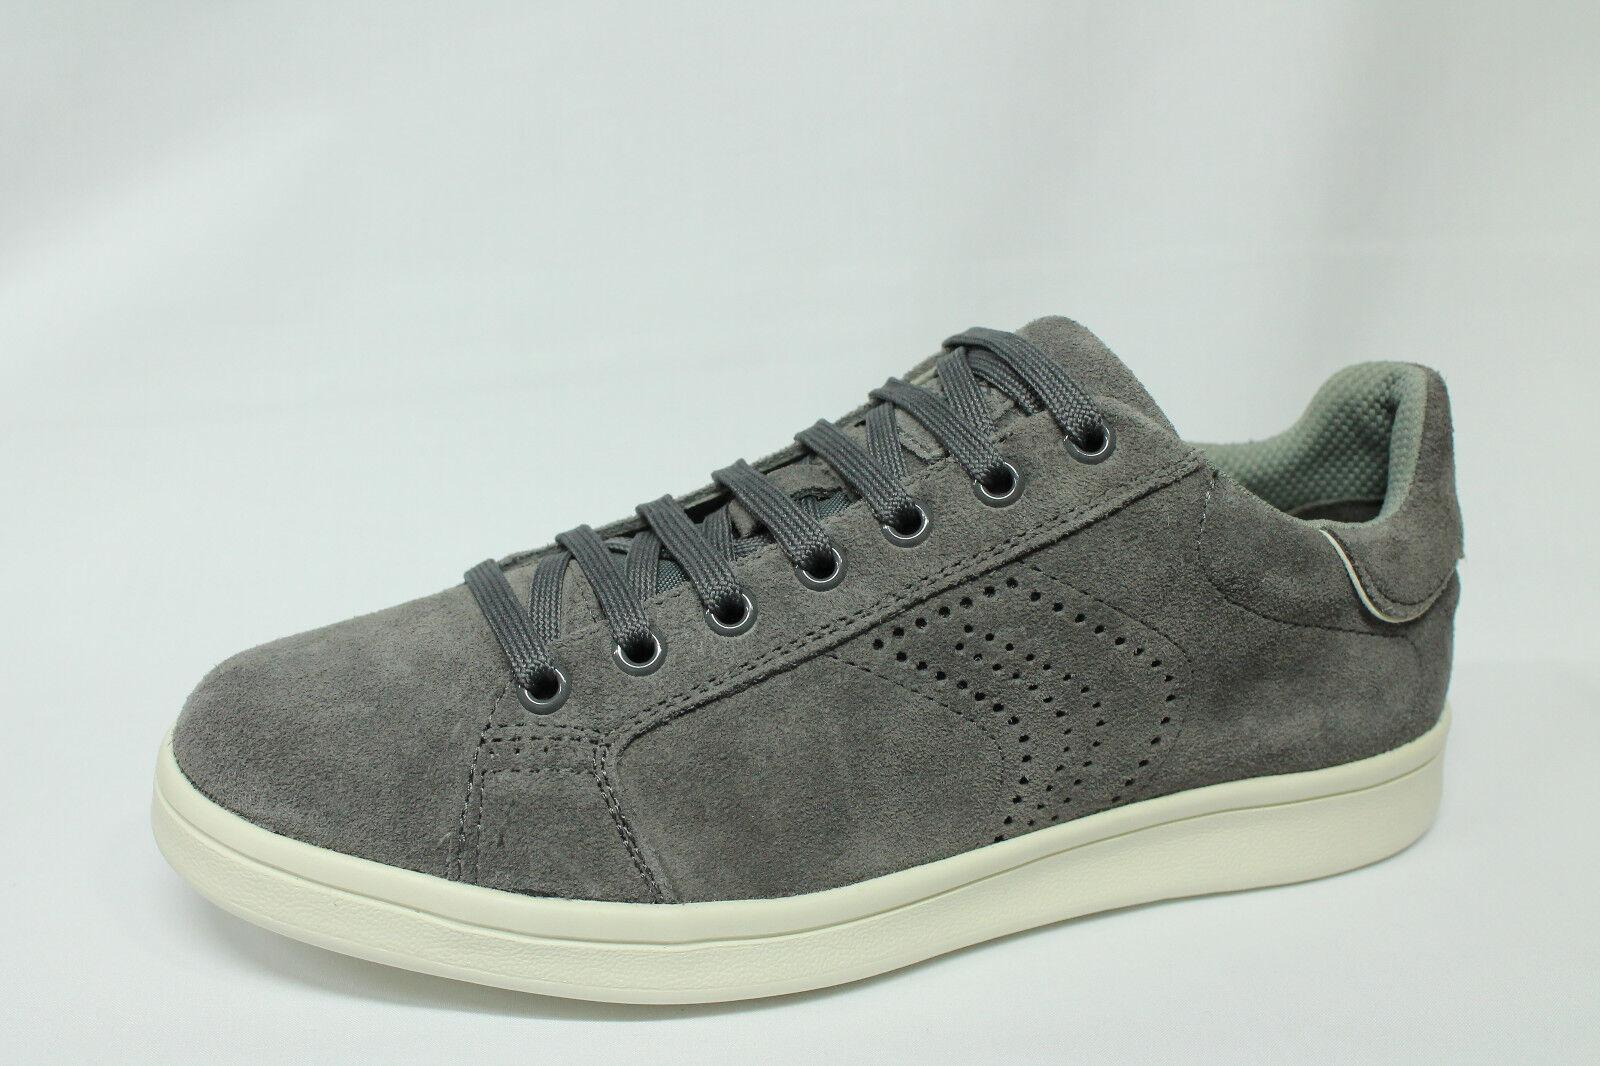 Calzado deportivo Geox u warrens B gamuza gris stansmith precio 99,90 - 20%